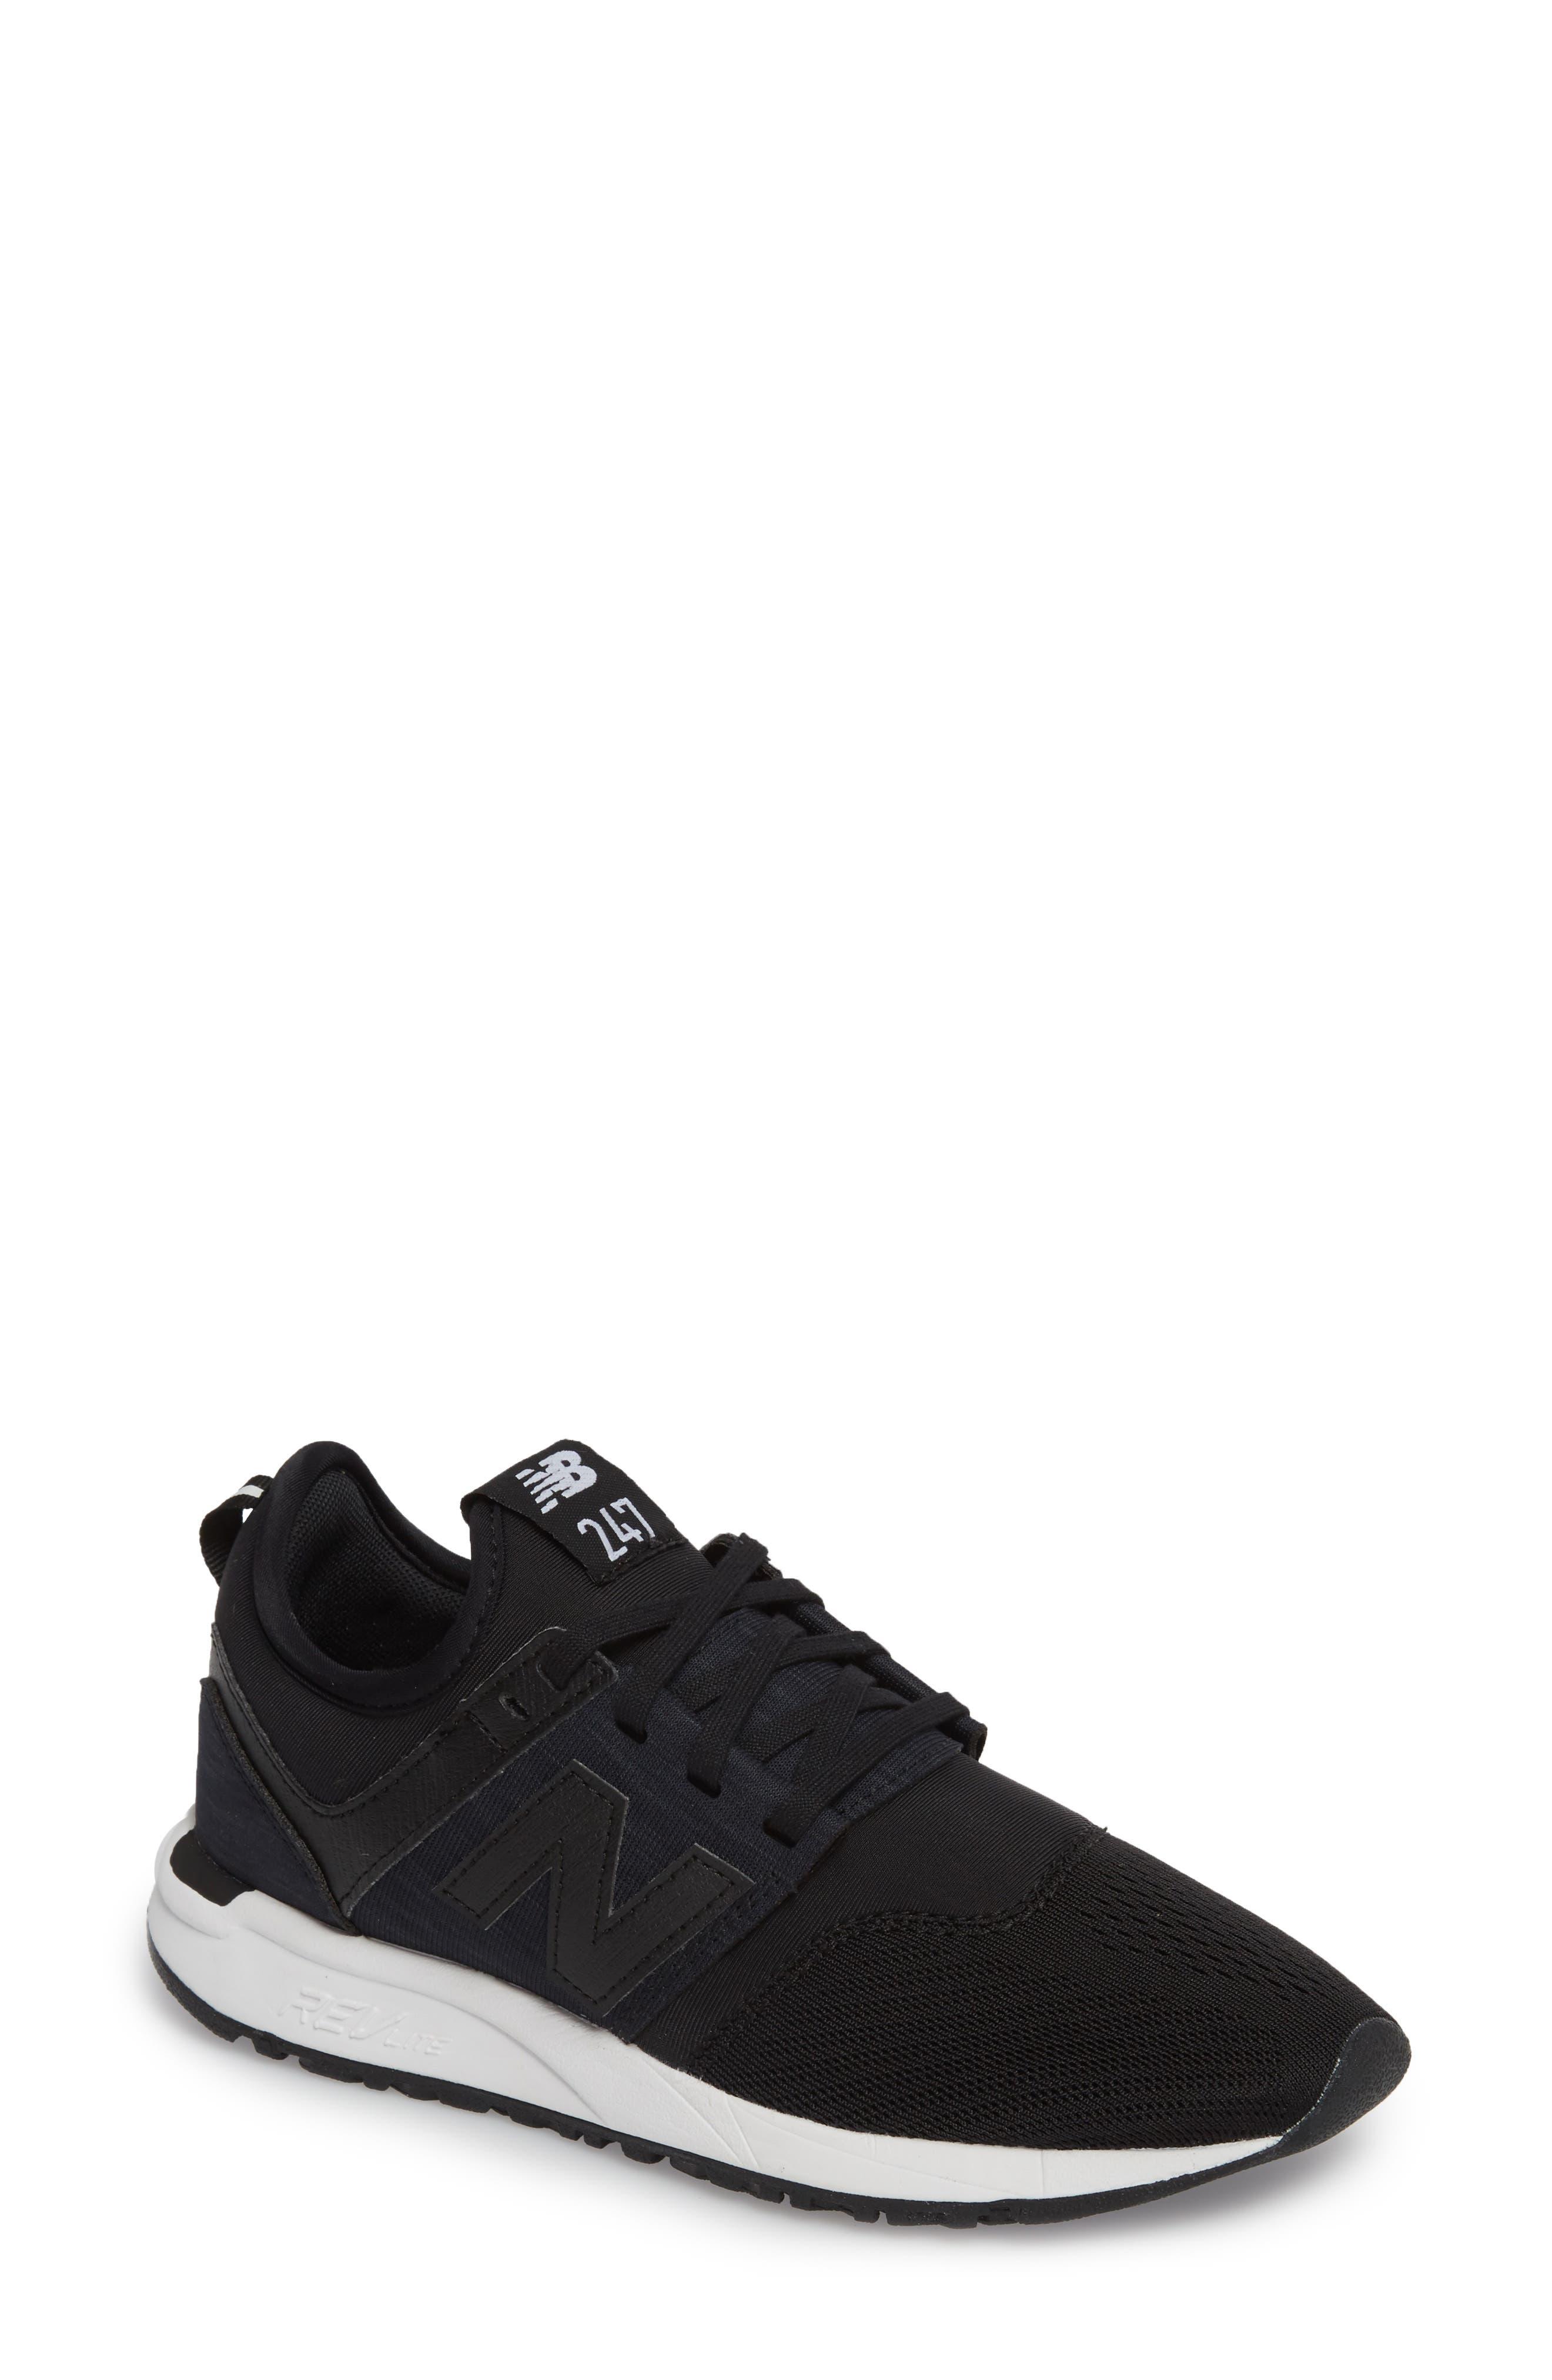 247 Classic Sneaker,                         Main,                         color, 001